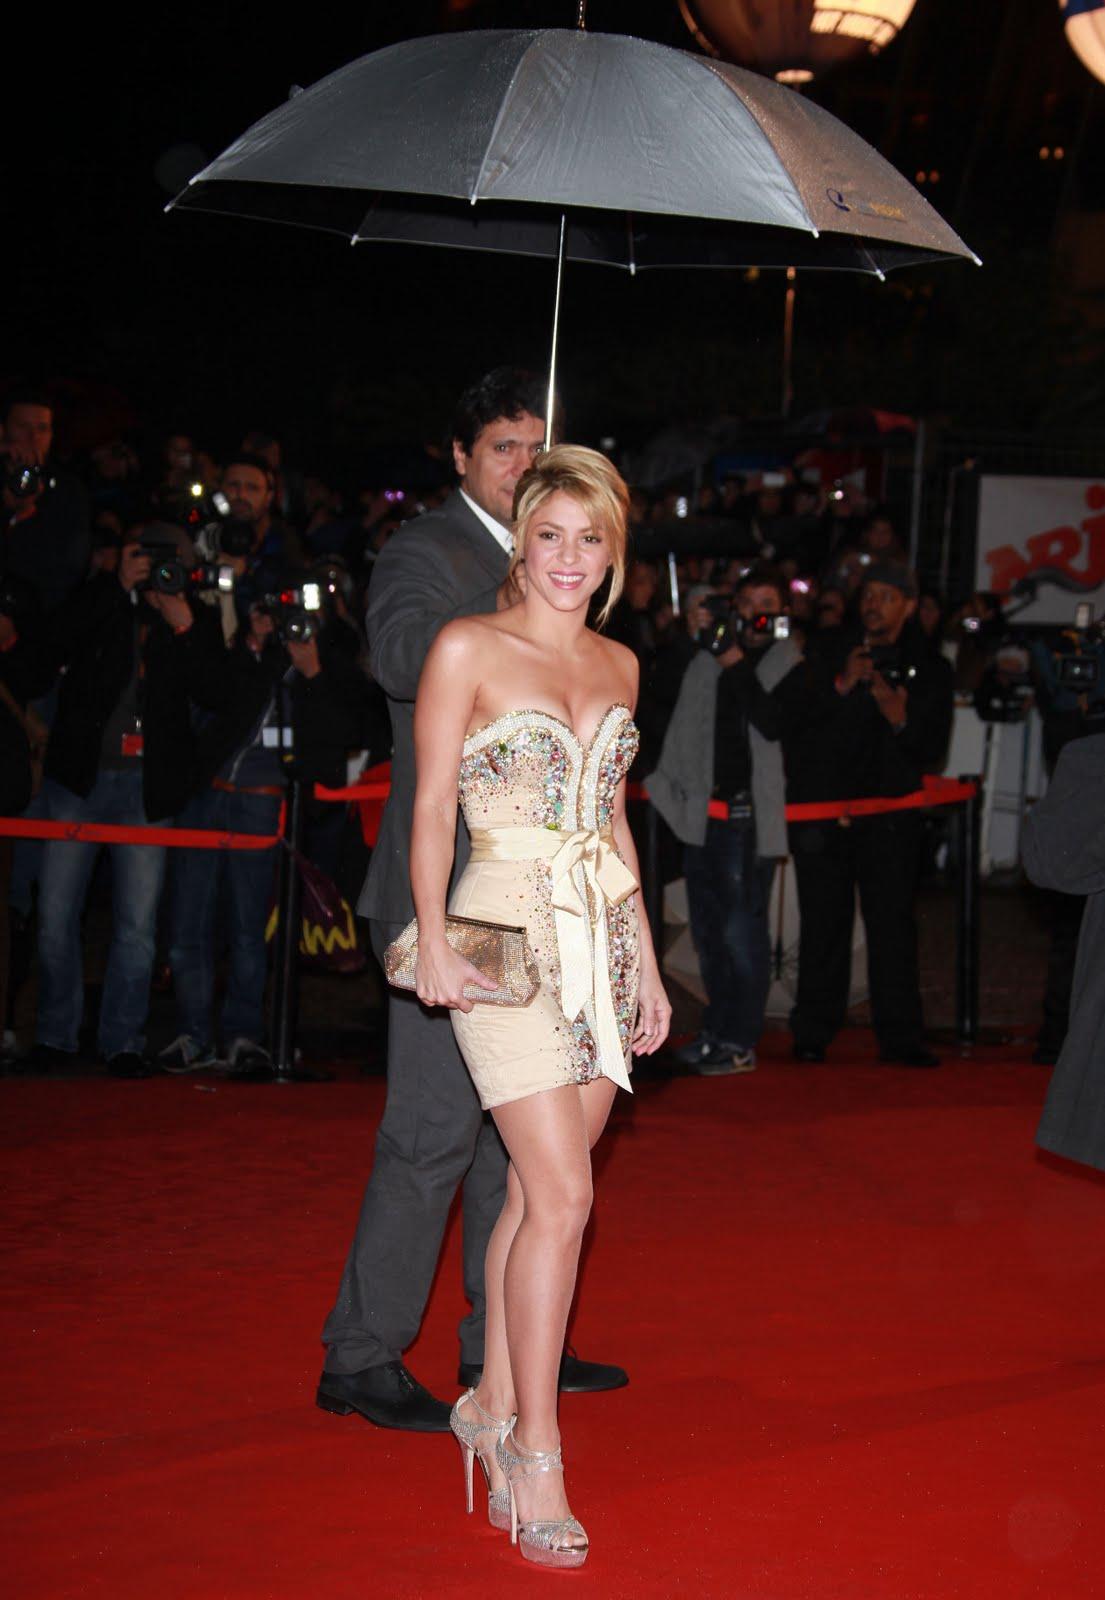 http://4.bp.blogspot.com/-imzx8Orv_go/TyWVcdJXbPI/AAAAAAAAESM/sSAjBS91O9o/s1600/Shakira%2B-%2BNRJ%2BMusic%2Bawards%2Bceremony%2B4.jpg